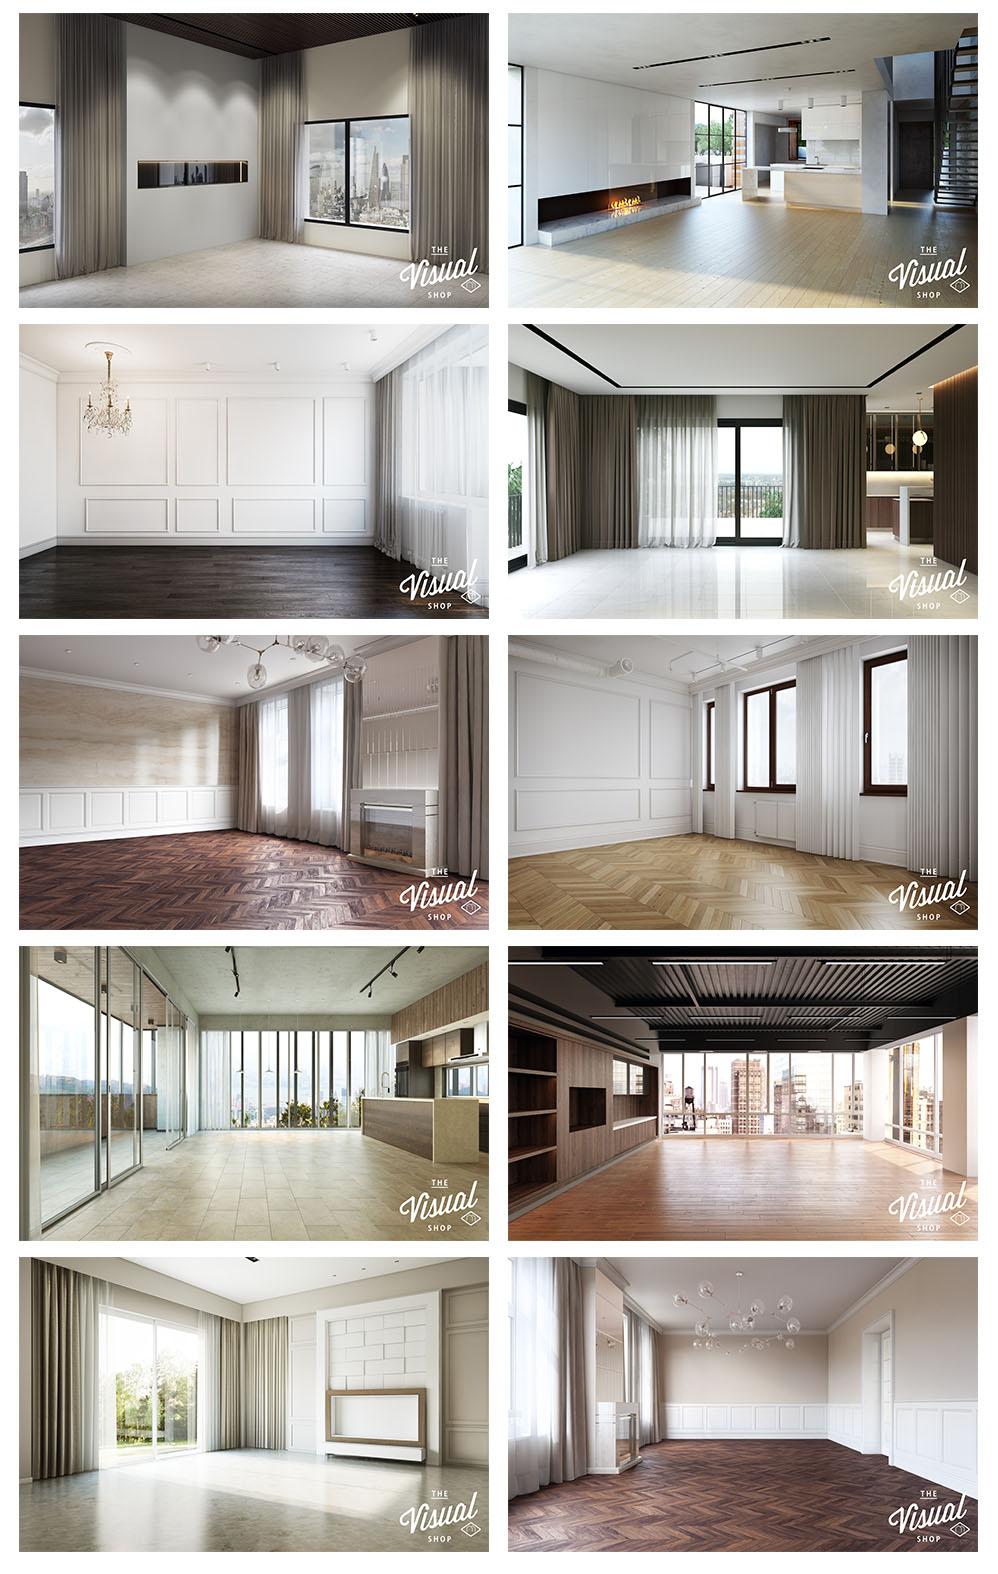 custom-decca-london-shell-rooms-unbuilt-visualisation